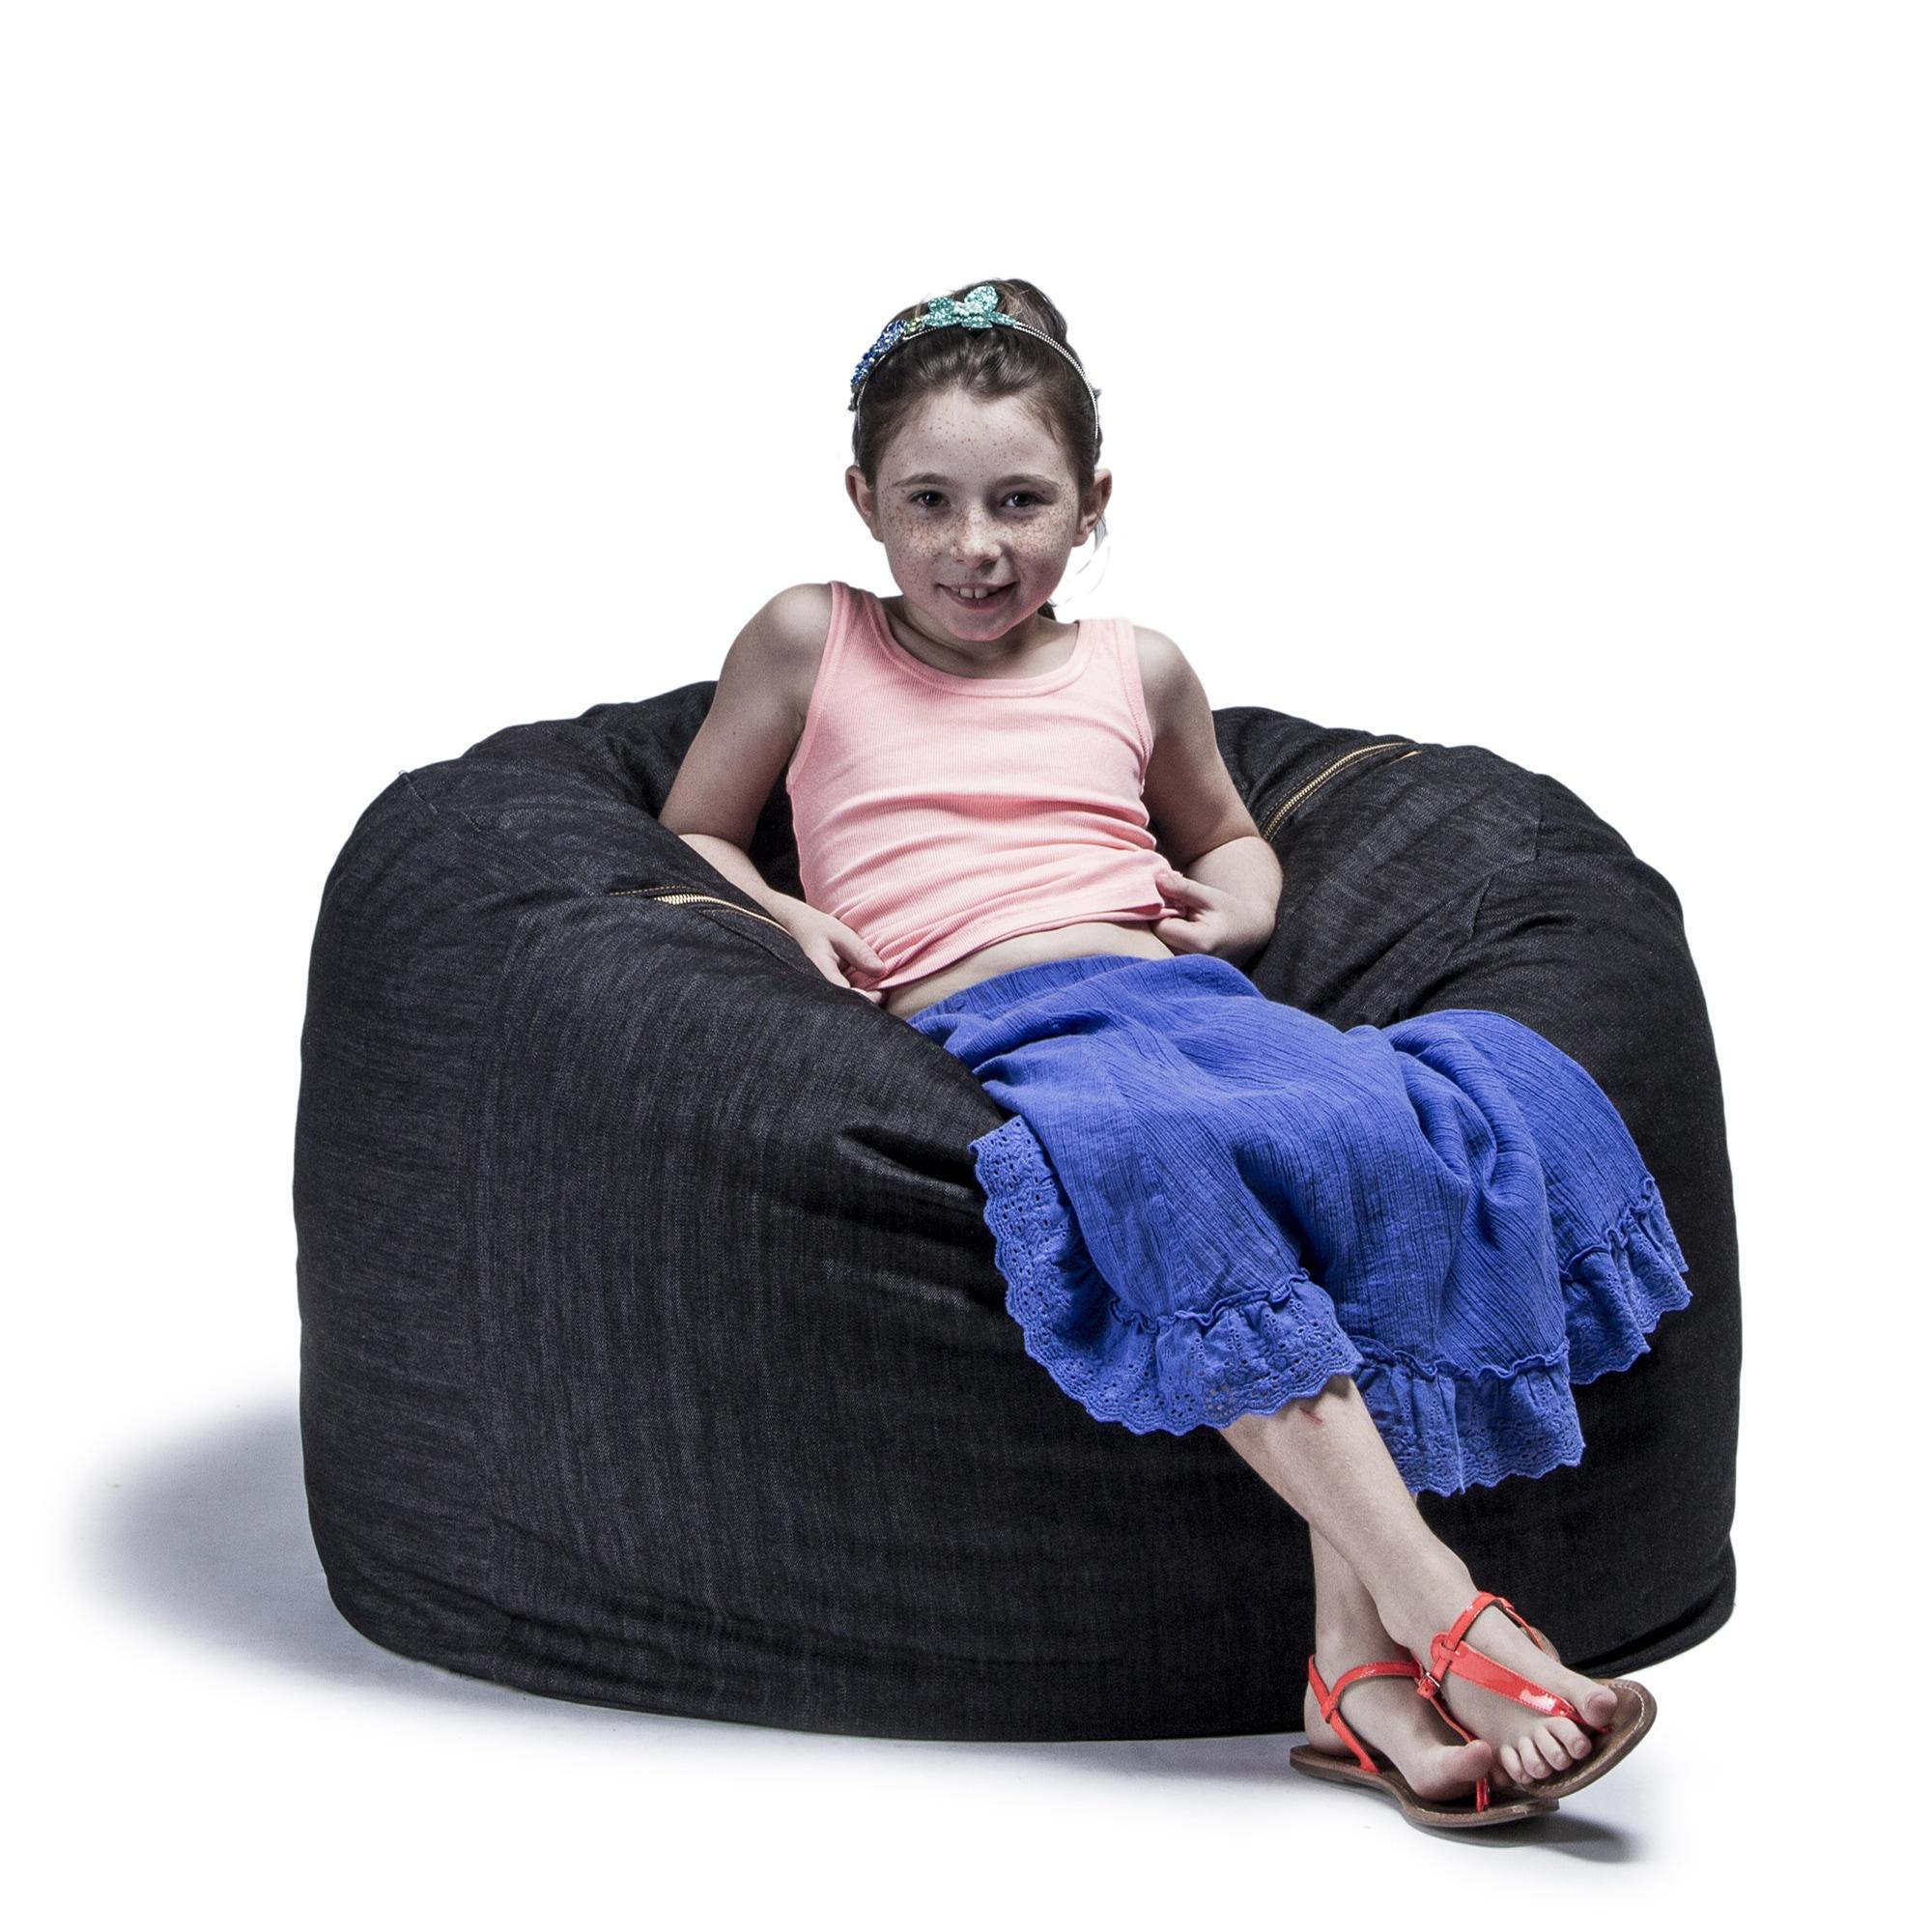 Denim Bean Bag Chair Shredded Foam Fill Seat Removable Cover Machine  Washable 3u0027